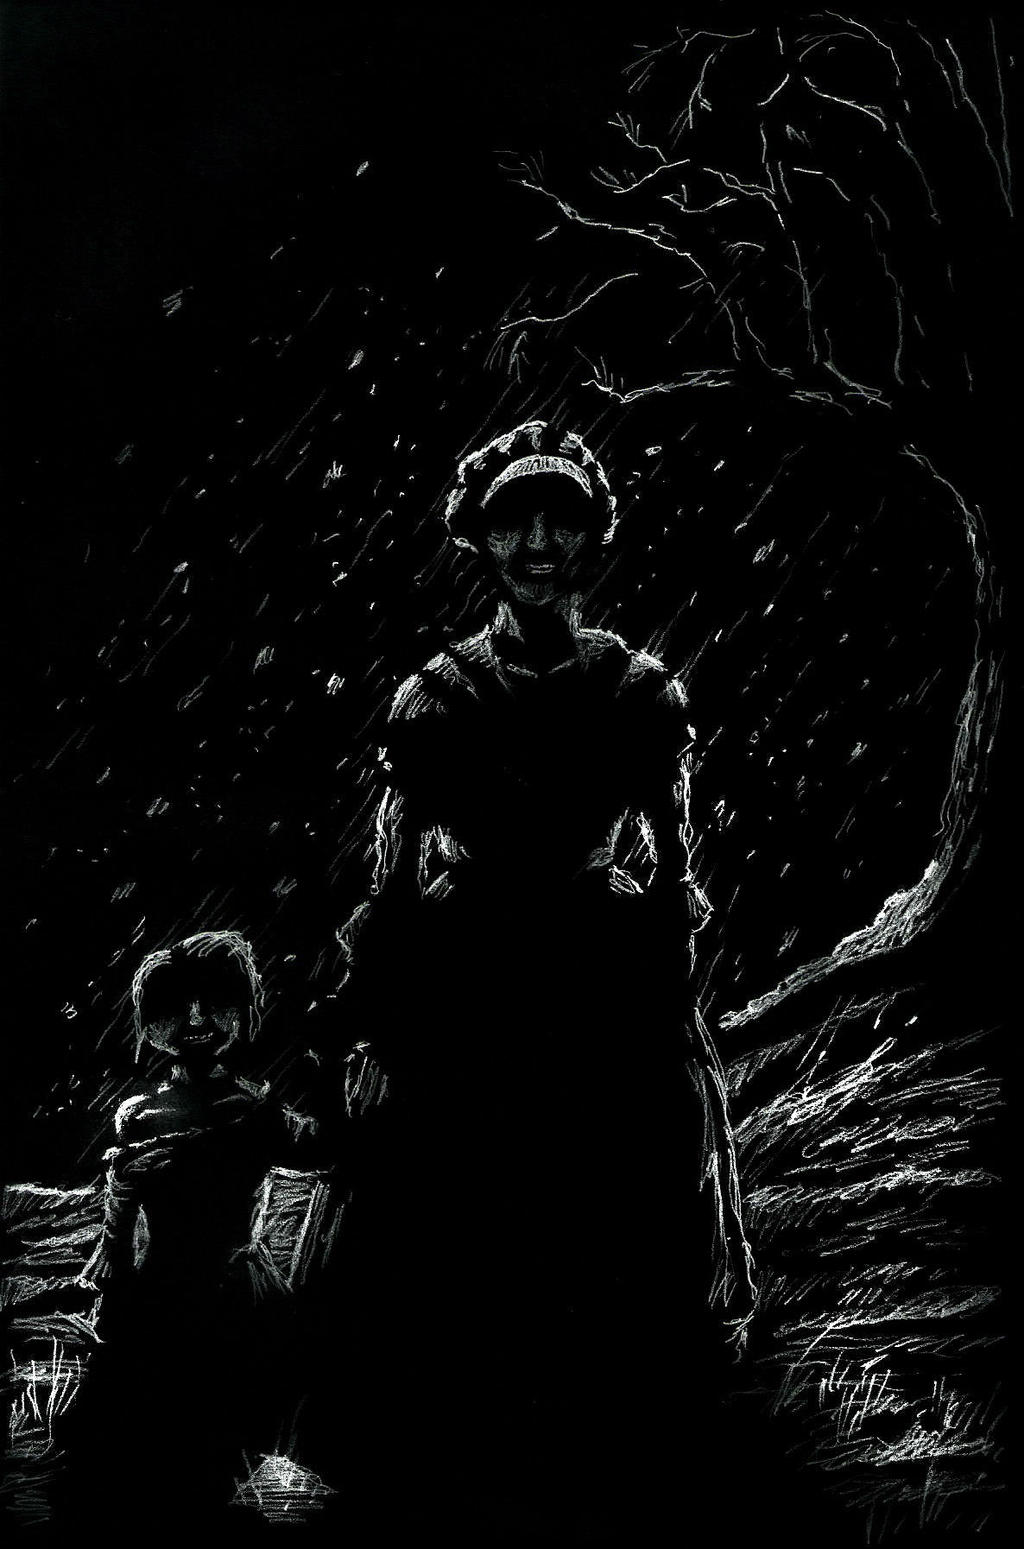 Elizabeth Gaskell - The Old Nurse's Story